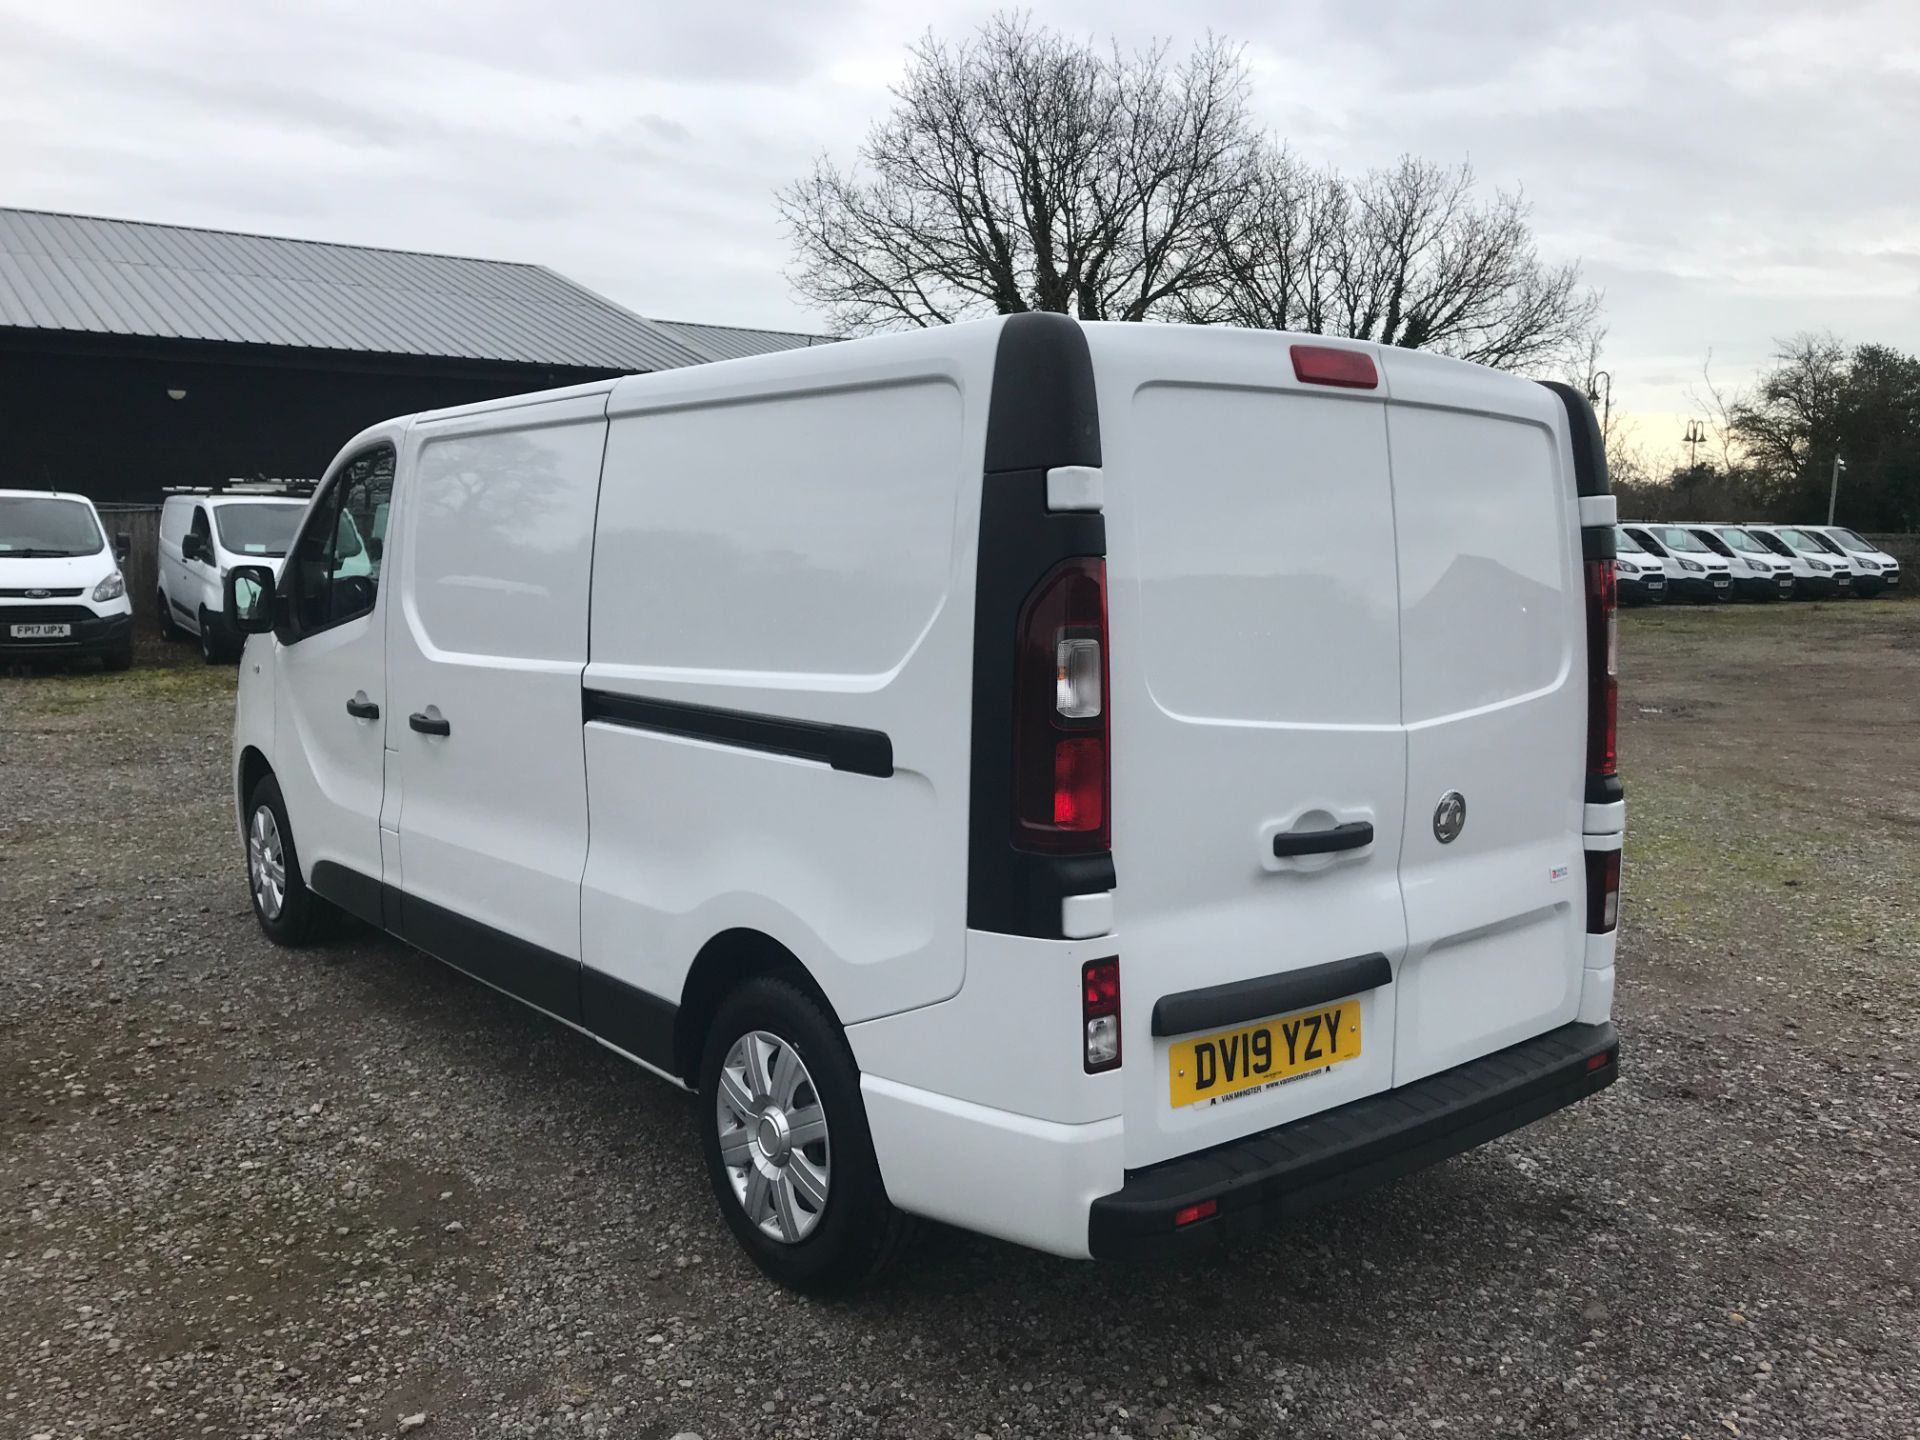 2019 Vauxhall Vivaro L2 H1 2900 1.6CDTI 120PS SPORTIVE EURO 6 (DV19YZY) Image 6